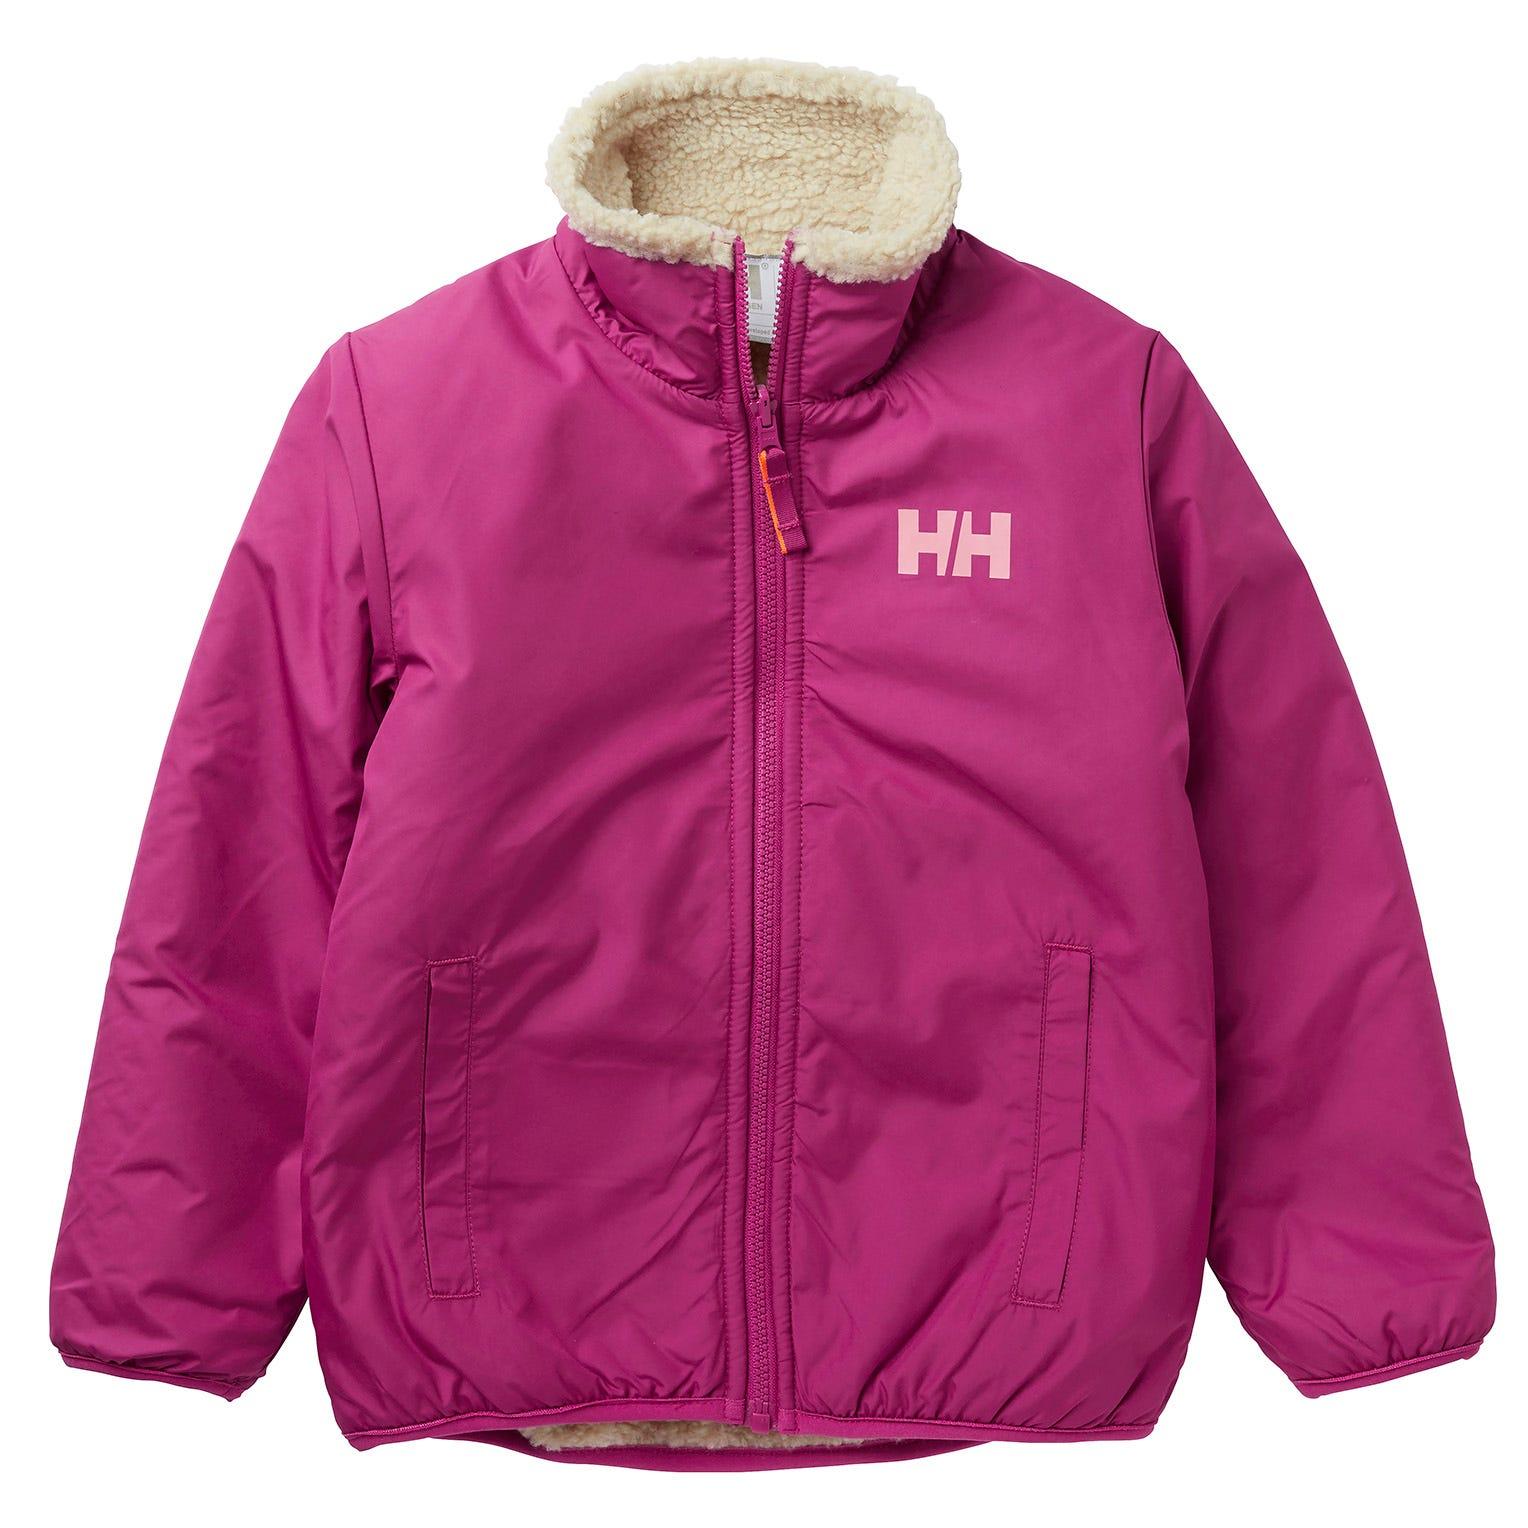 Helly Hansen Kids Reversible Pile Jacket Parka Yellow 98/3